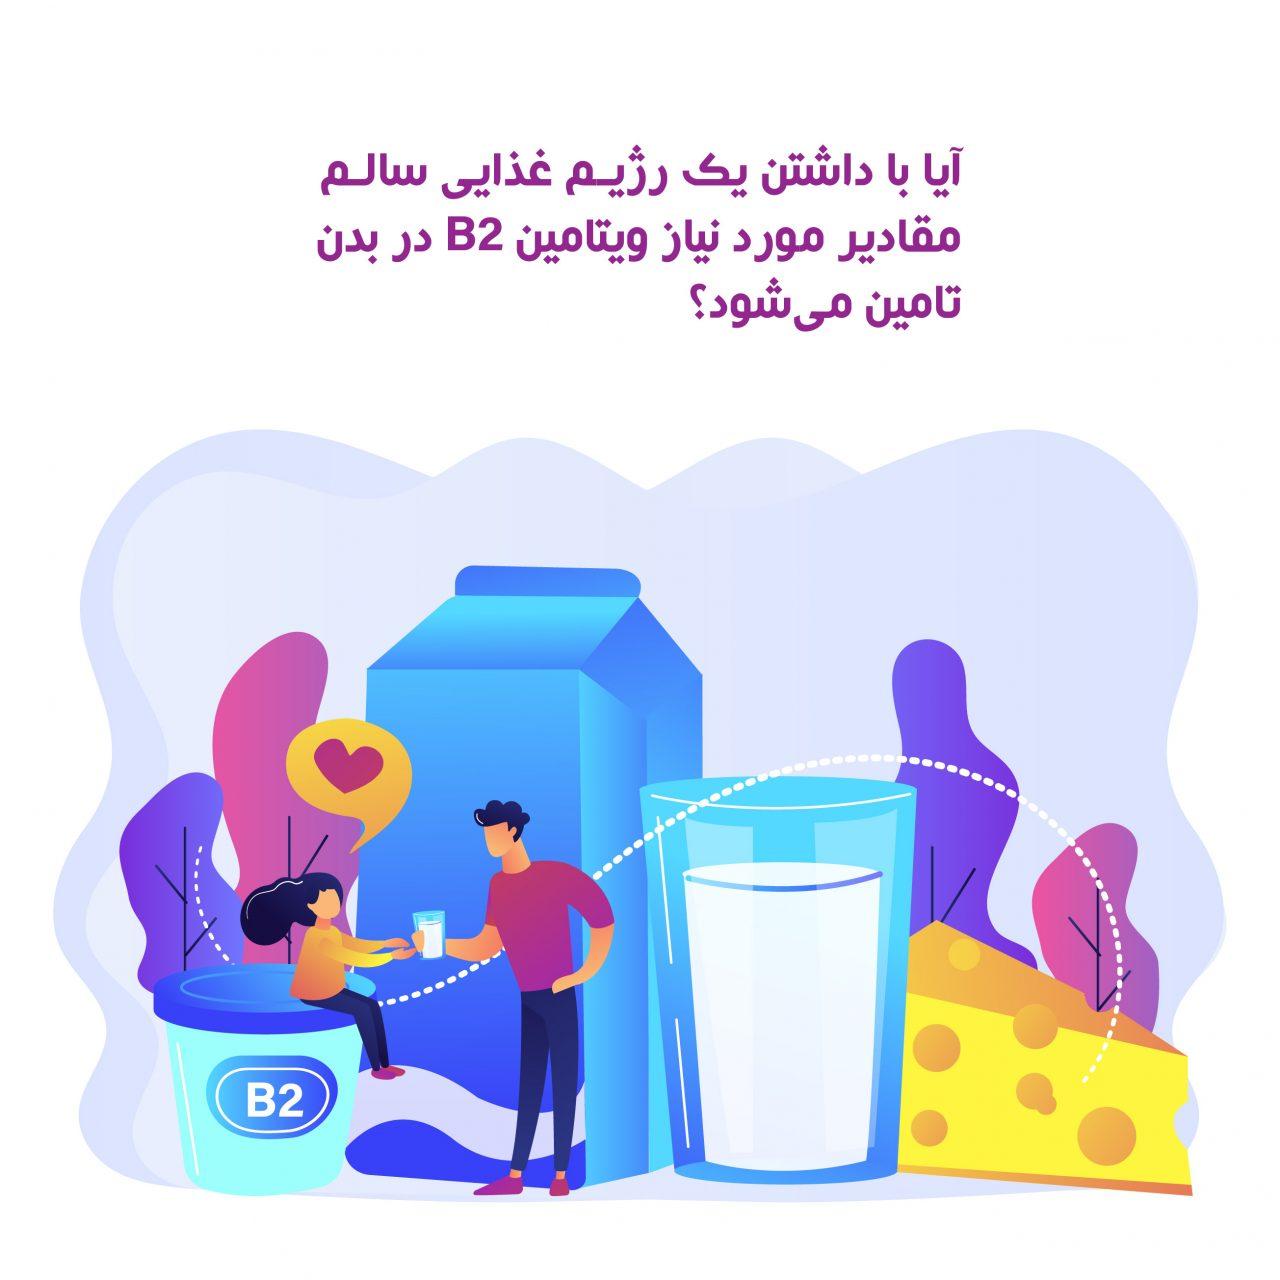 https://hakimanteb.com/wp-content/uploads/2021/01/aya_ba_dashtan_yek_rezhim_ghazaei_salem_maghadir_morede_niaz_b2-1280x1280.jpg